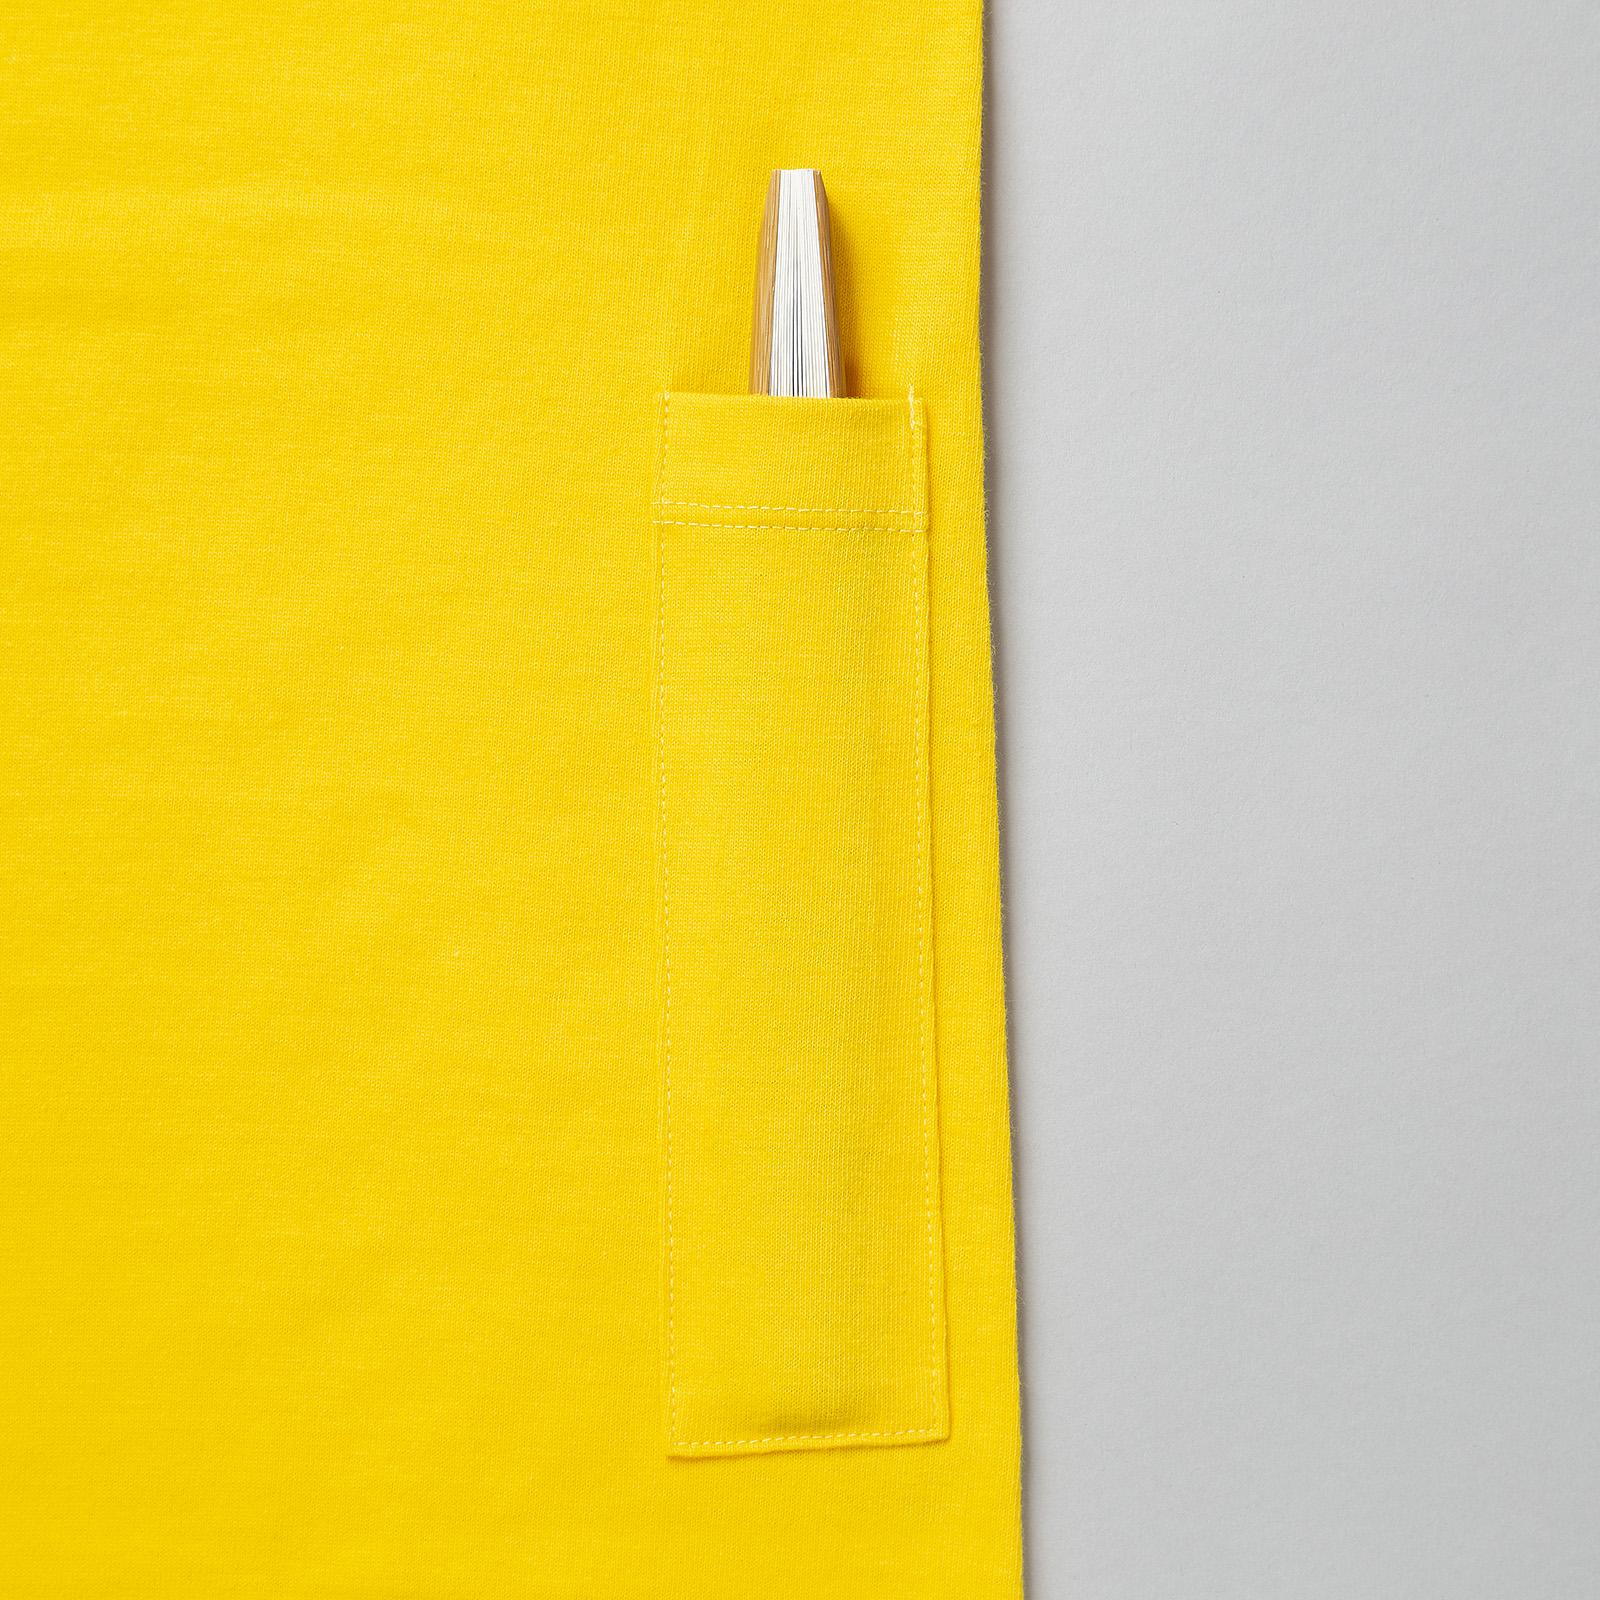 %e3%80%8cbanana-to-yellow%e3%80%8d-14